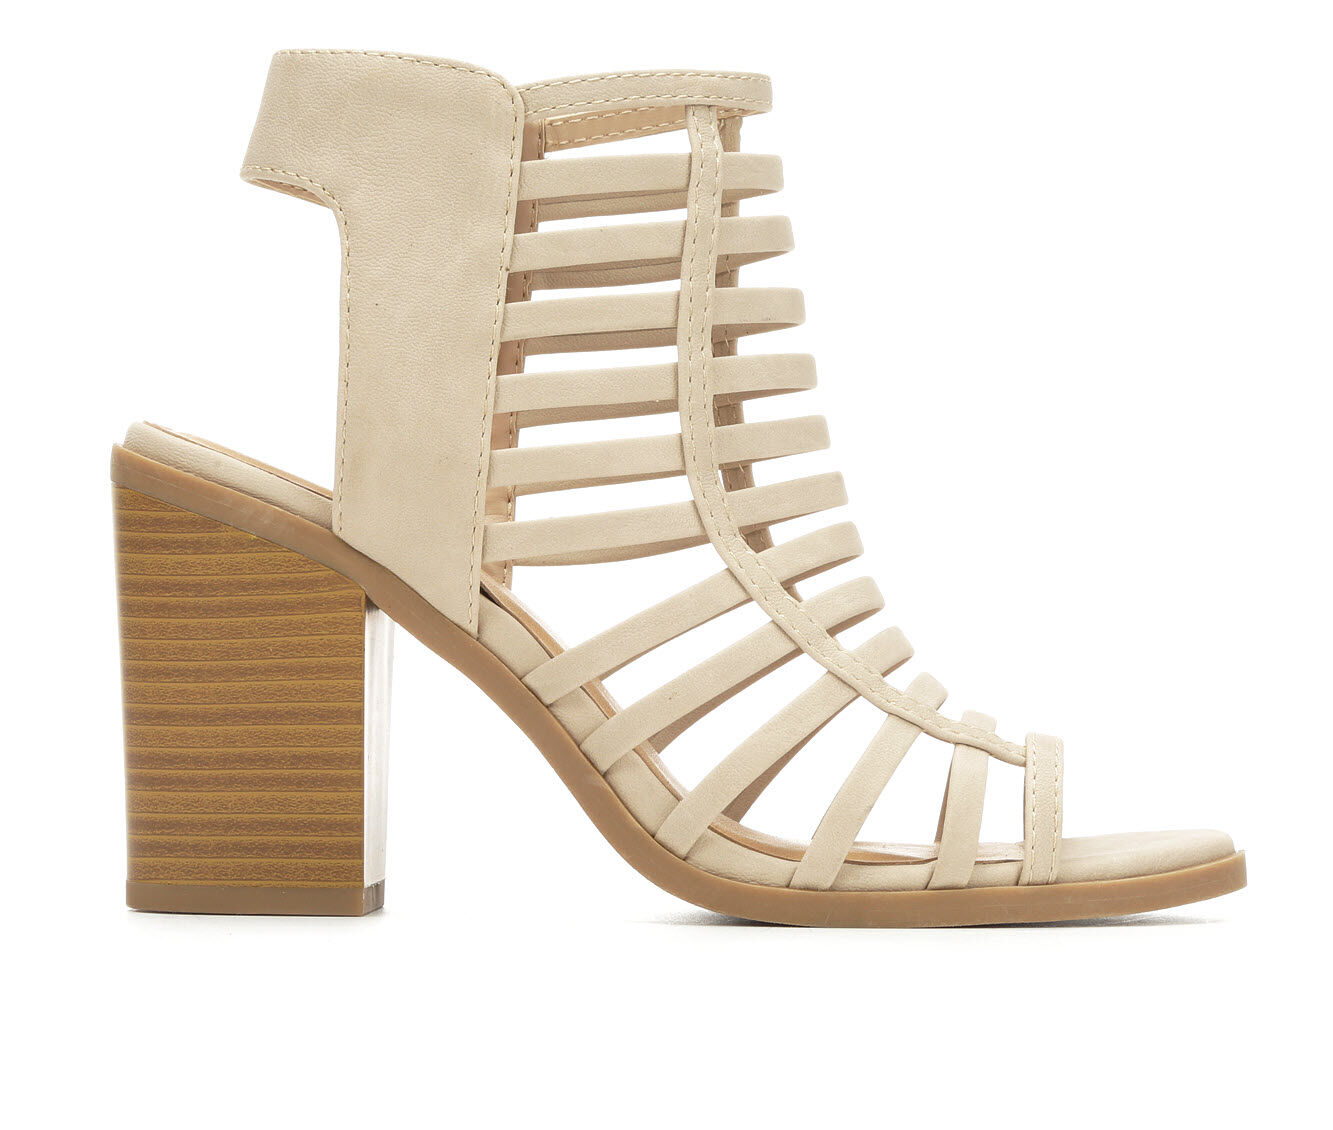 uk shoes_kd6841